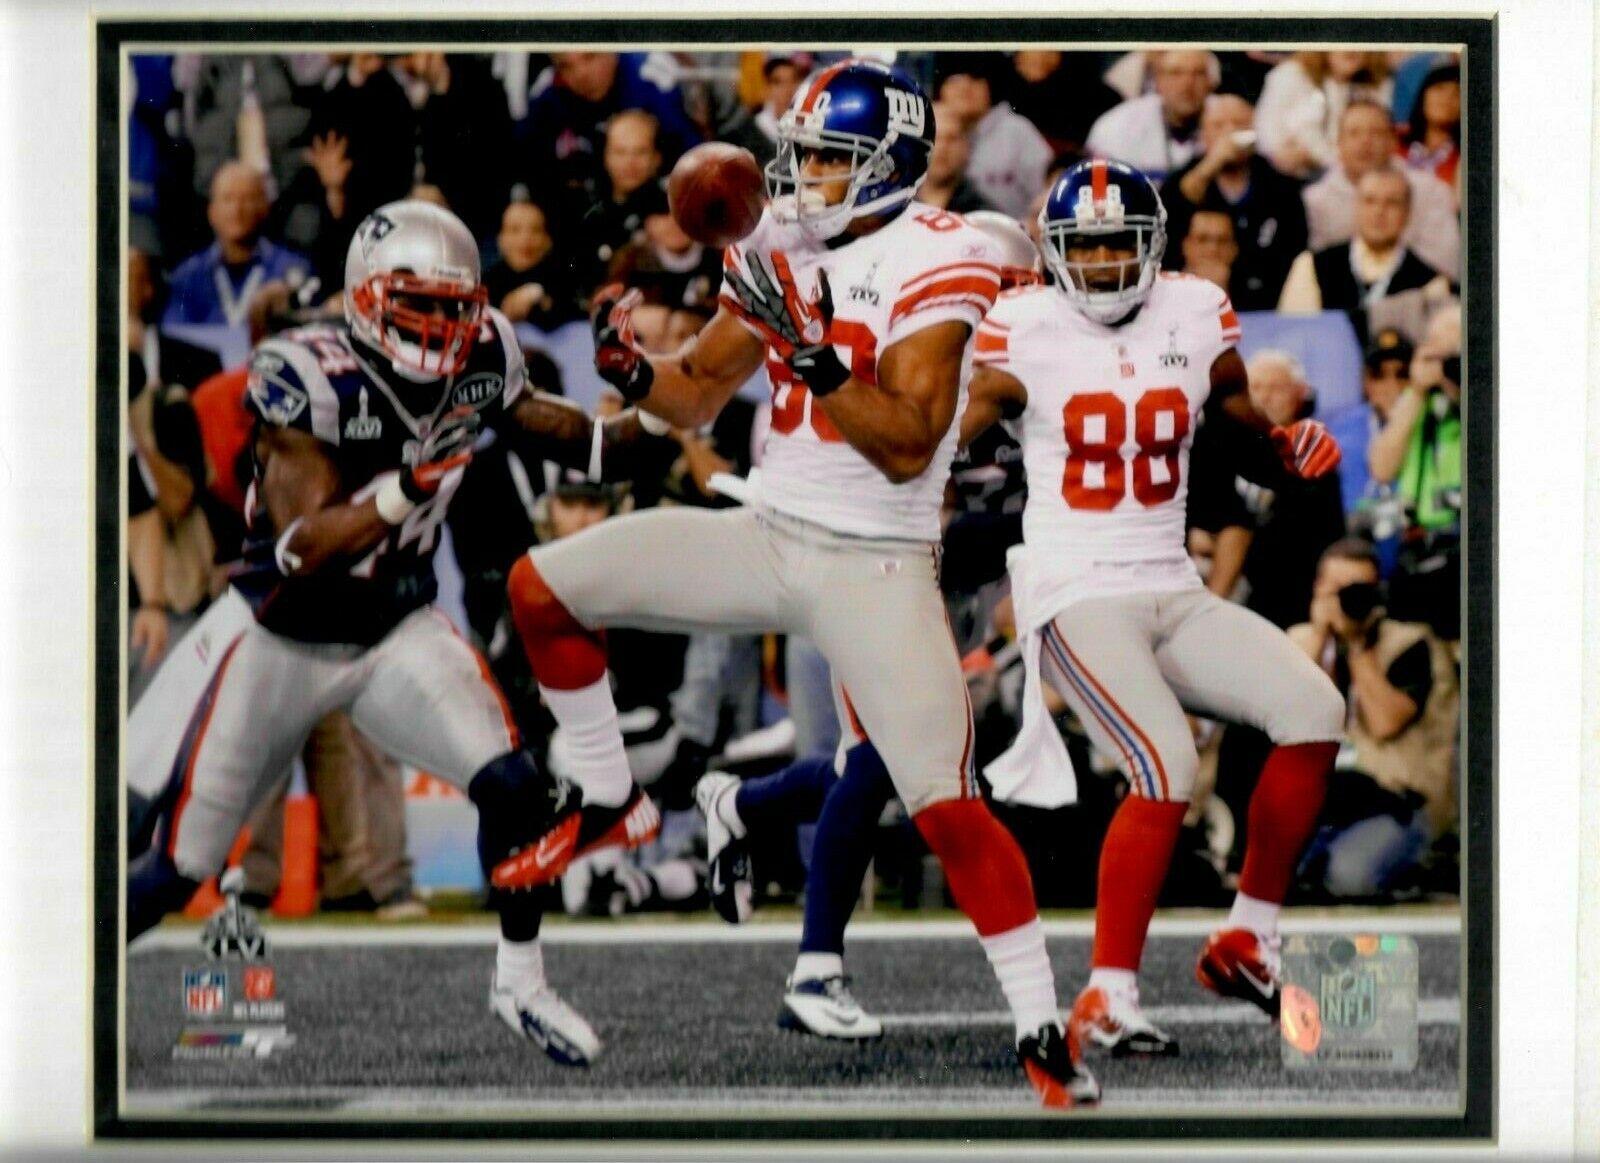 2012 SUPER BOWL XLVI Ahmad Bradshaw TOUCHDOWN New York Giants poster 8x10 photo